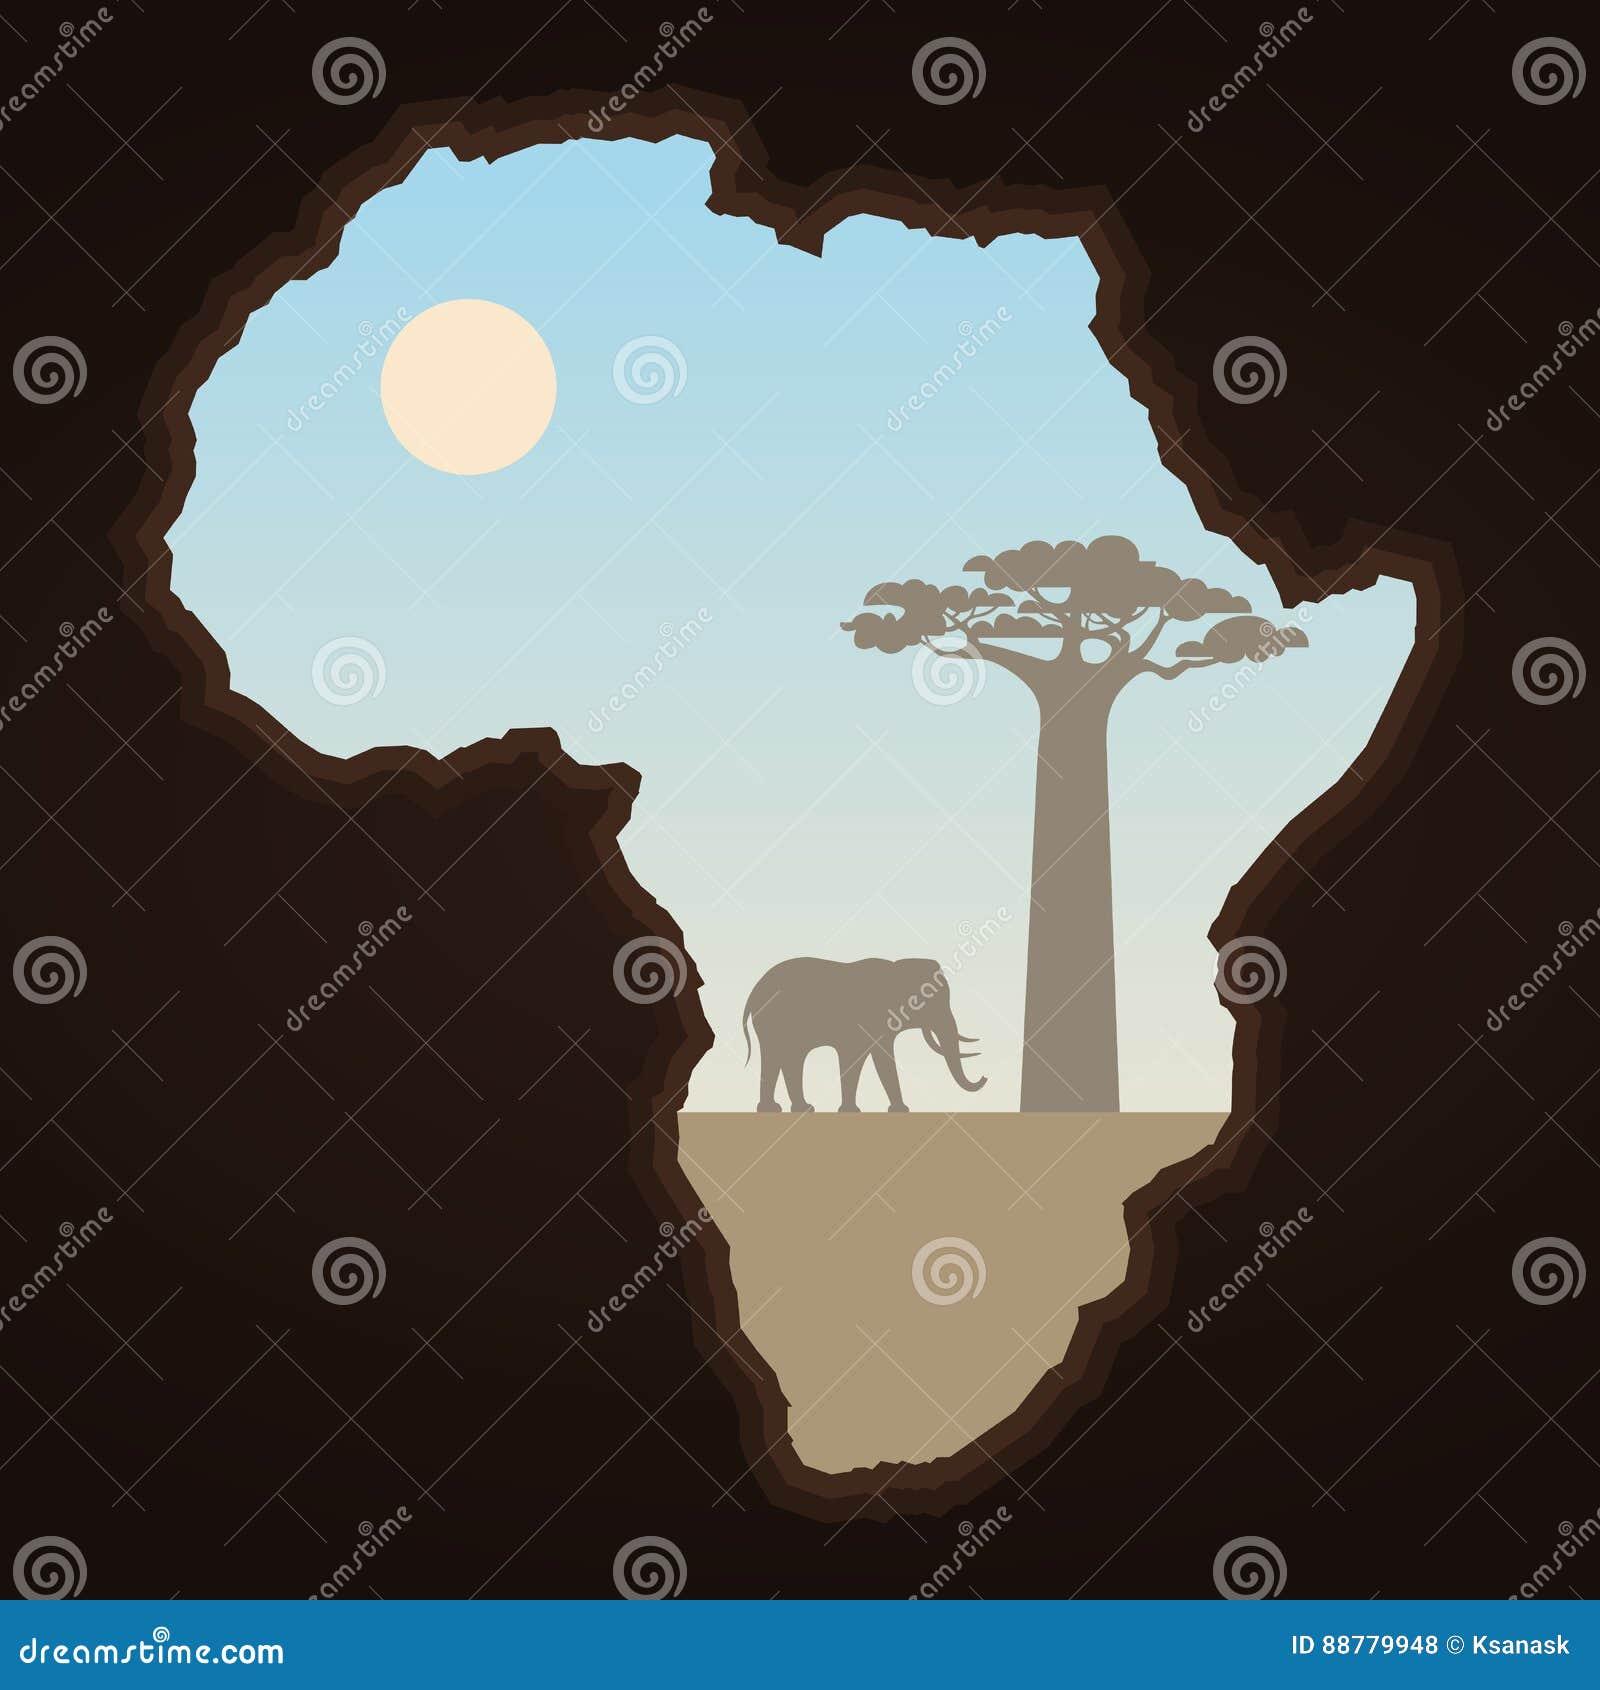 Afryka krajobraz i kontynent